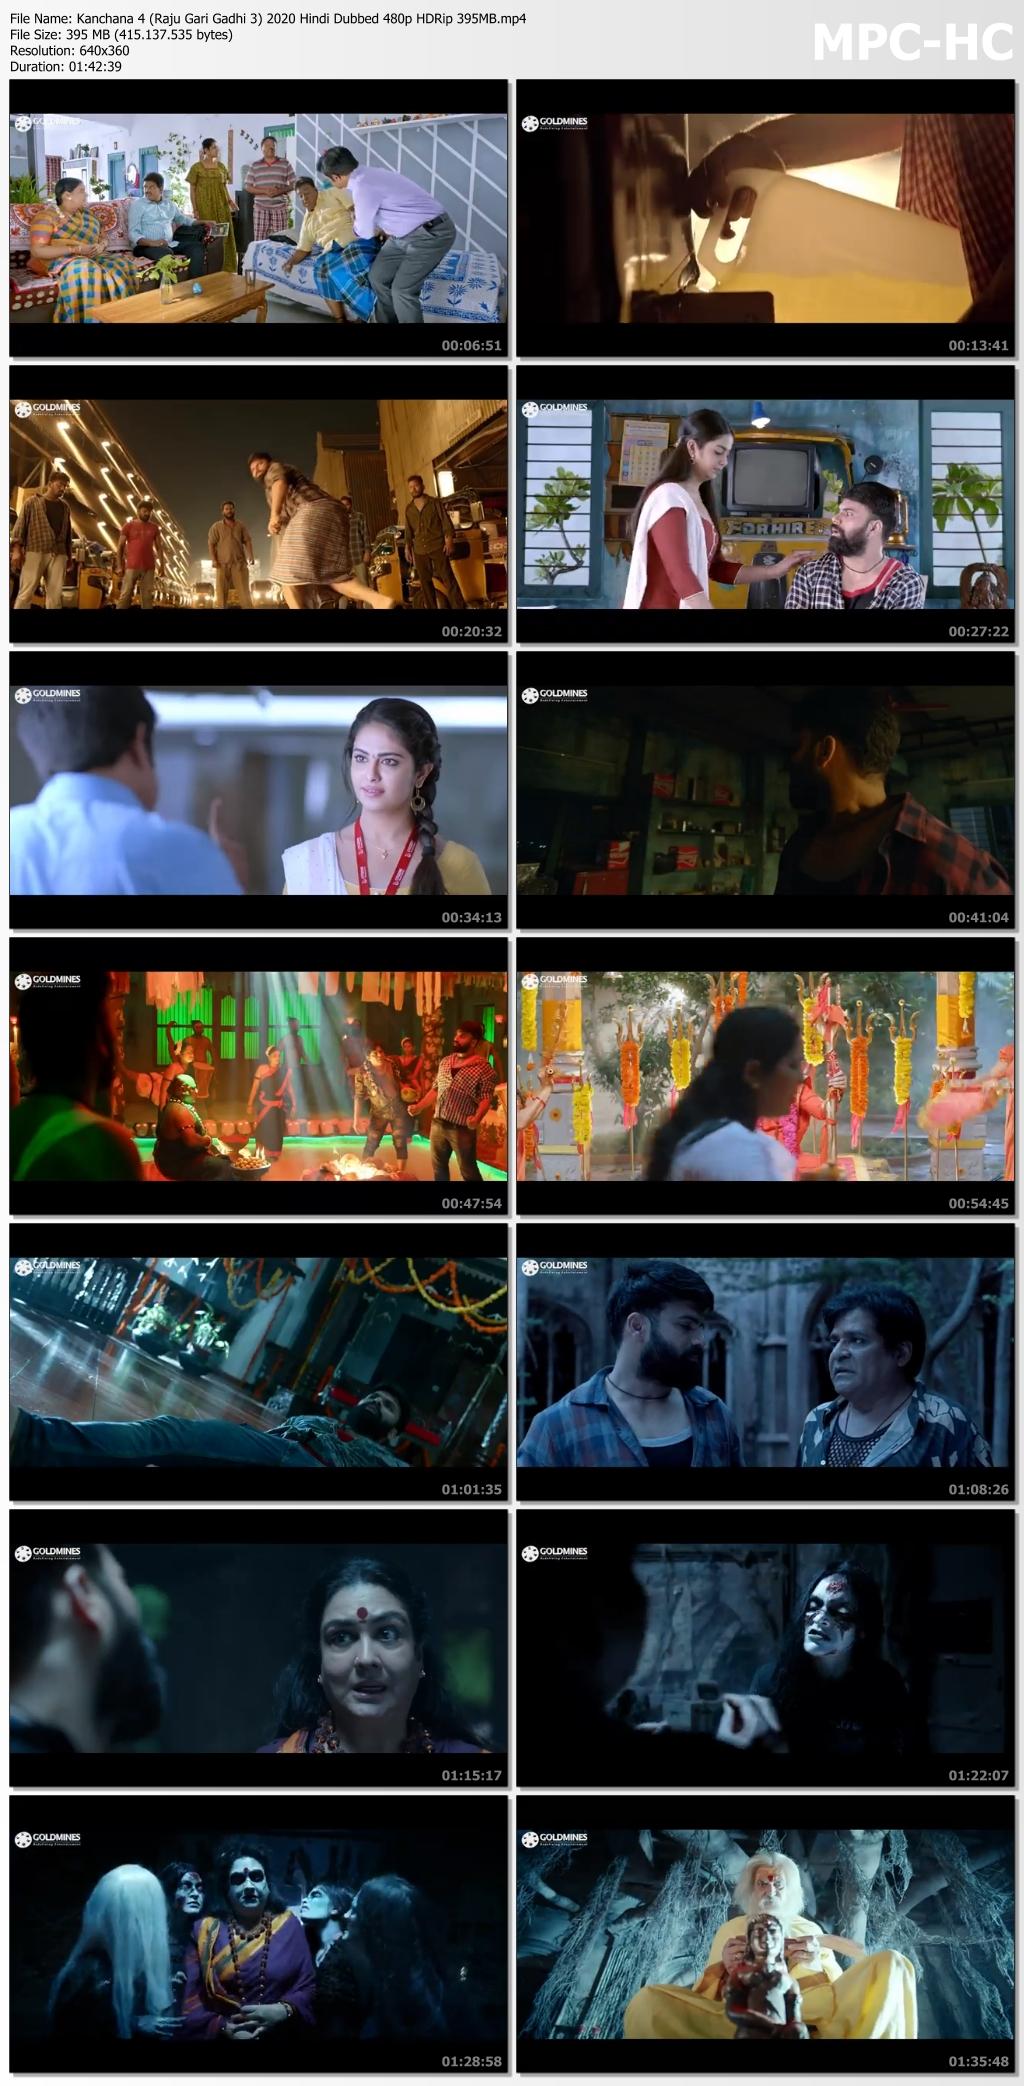 Kanchana-4-Raju-Gari-Gadhi-3-2020-Hindi-Dubbed-480p-HDRip-395-MB-mp4-thumbs